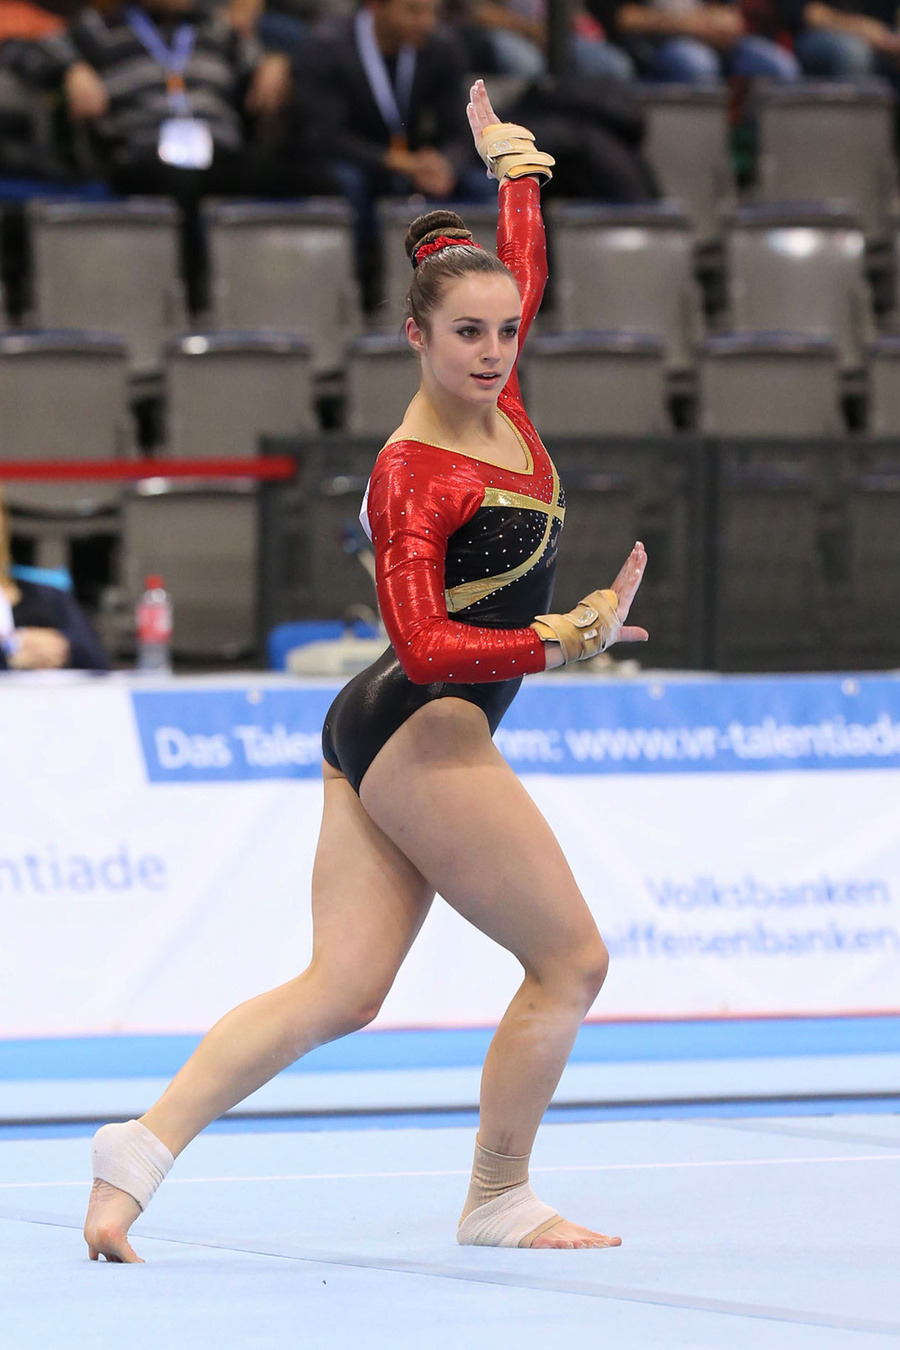 Nastya Kochetkova was robbed in Spain 06/16/2010 99